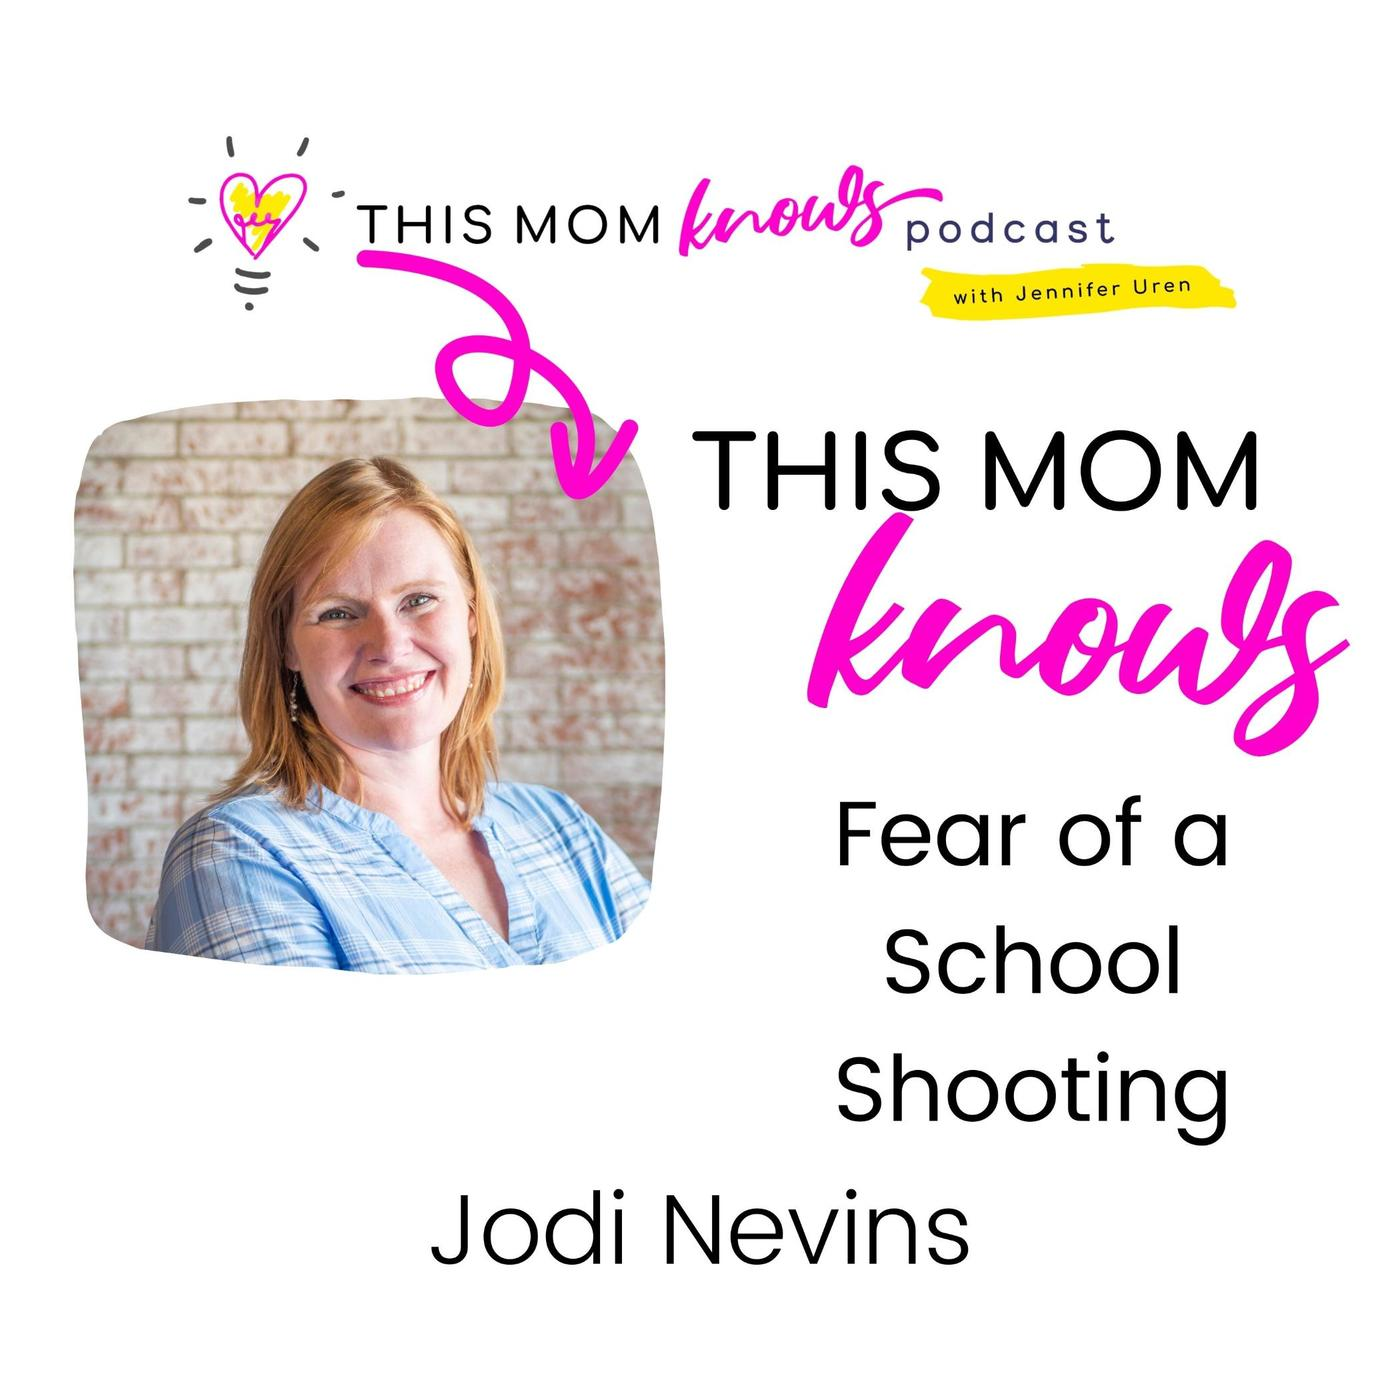 Jodi Nevins on Fear of a School Shooting